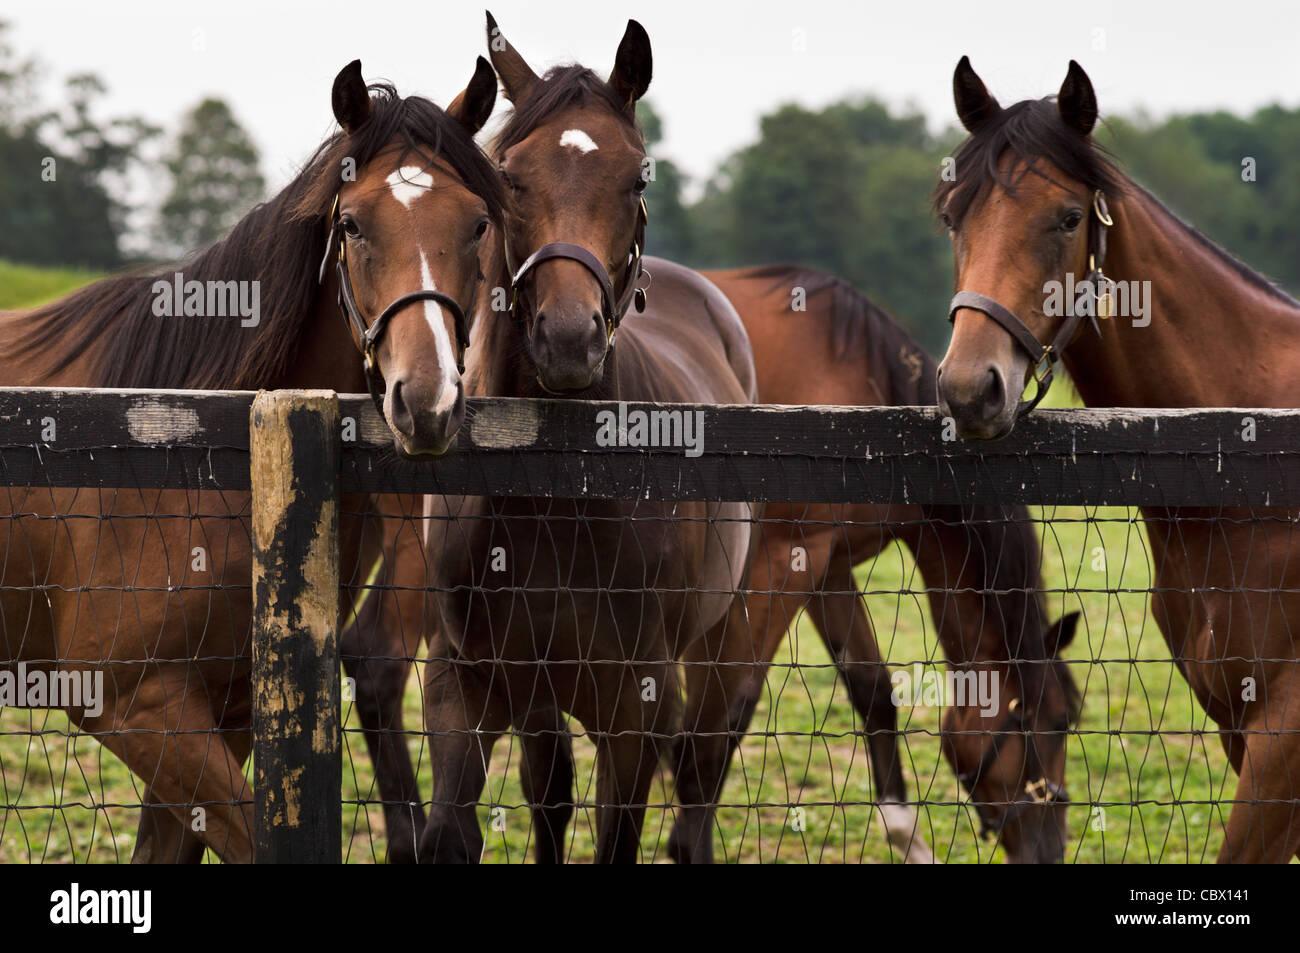 HORSE FARM GHENT NEW YORK - Stock Image